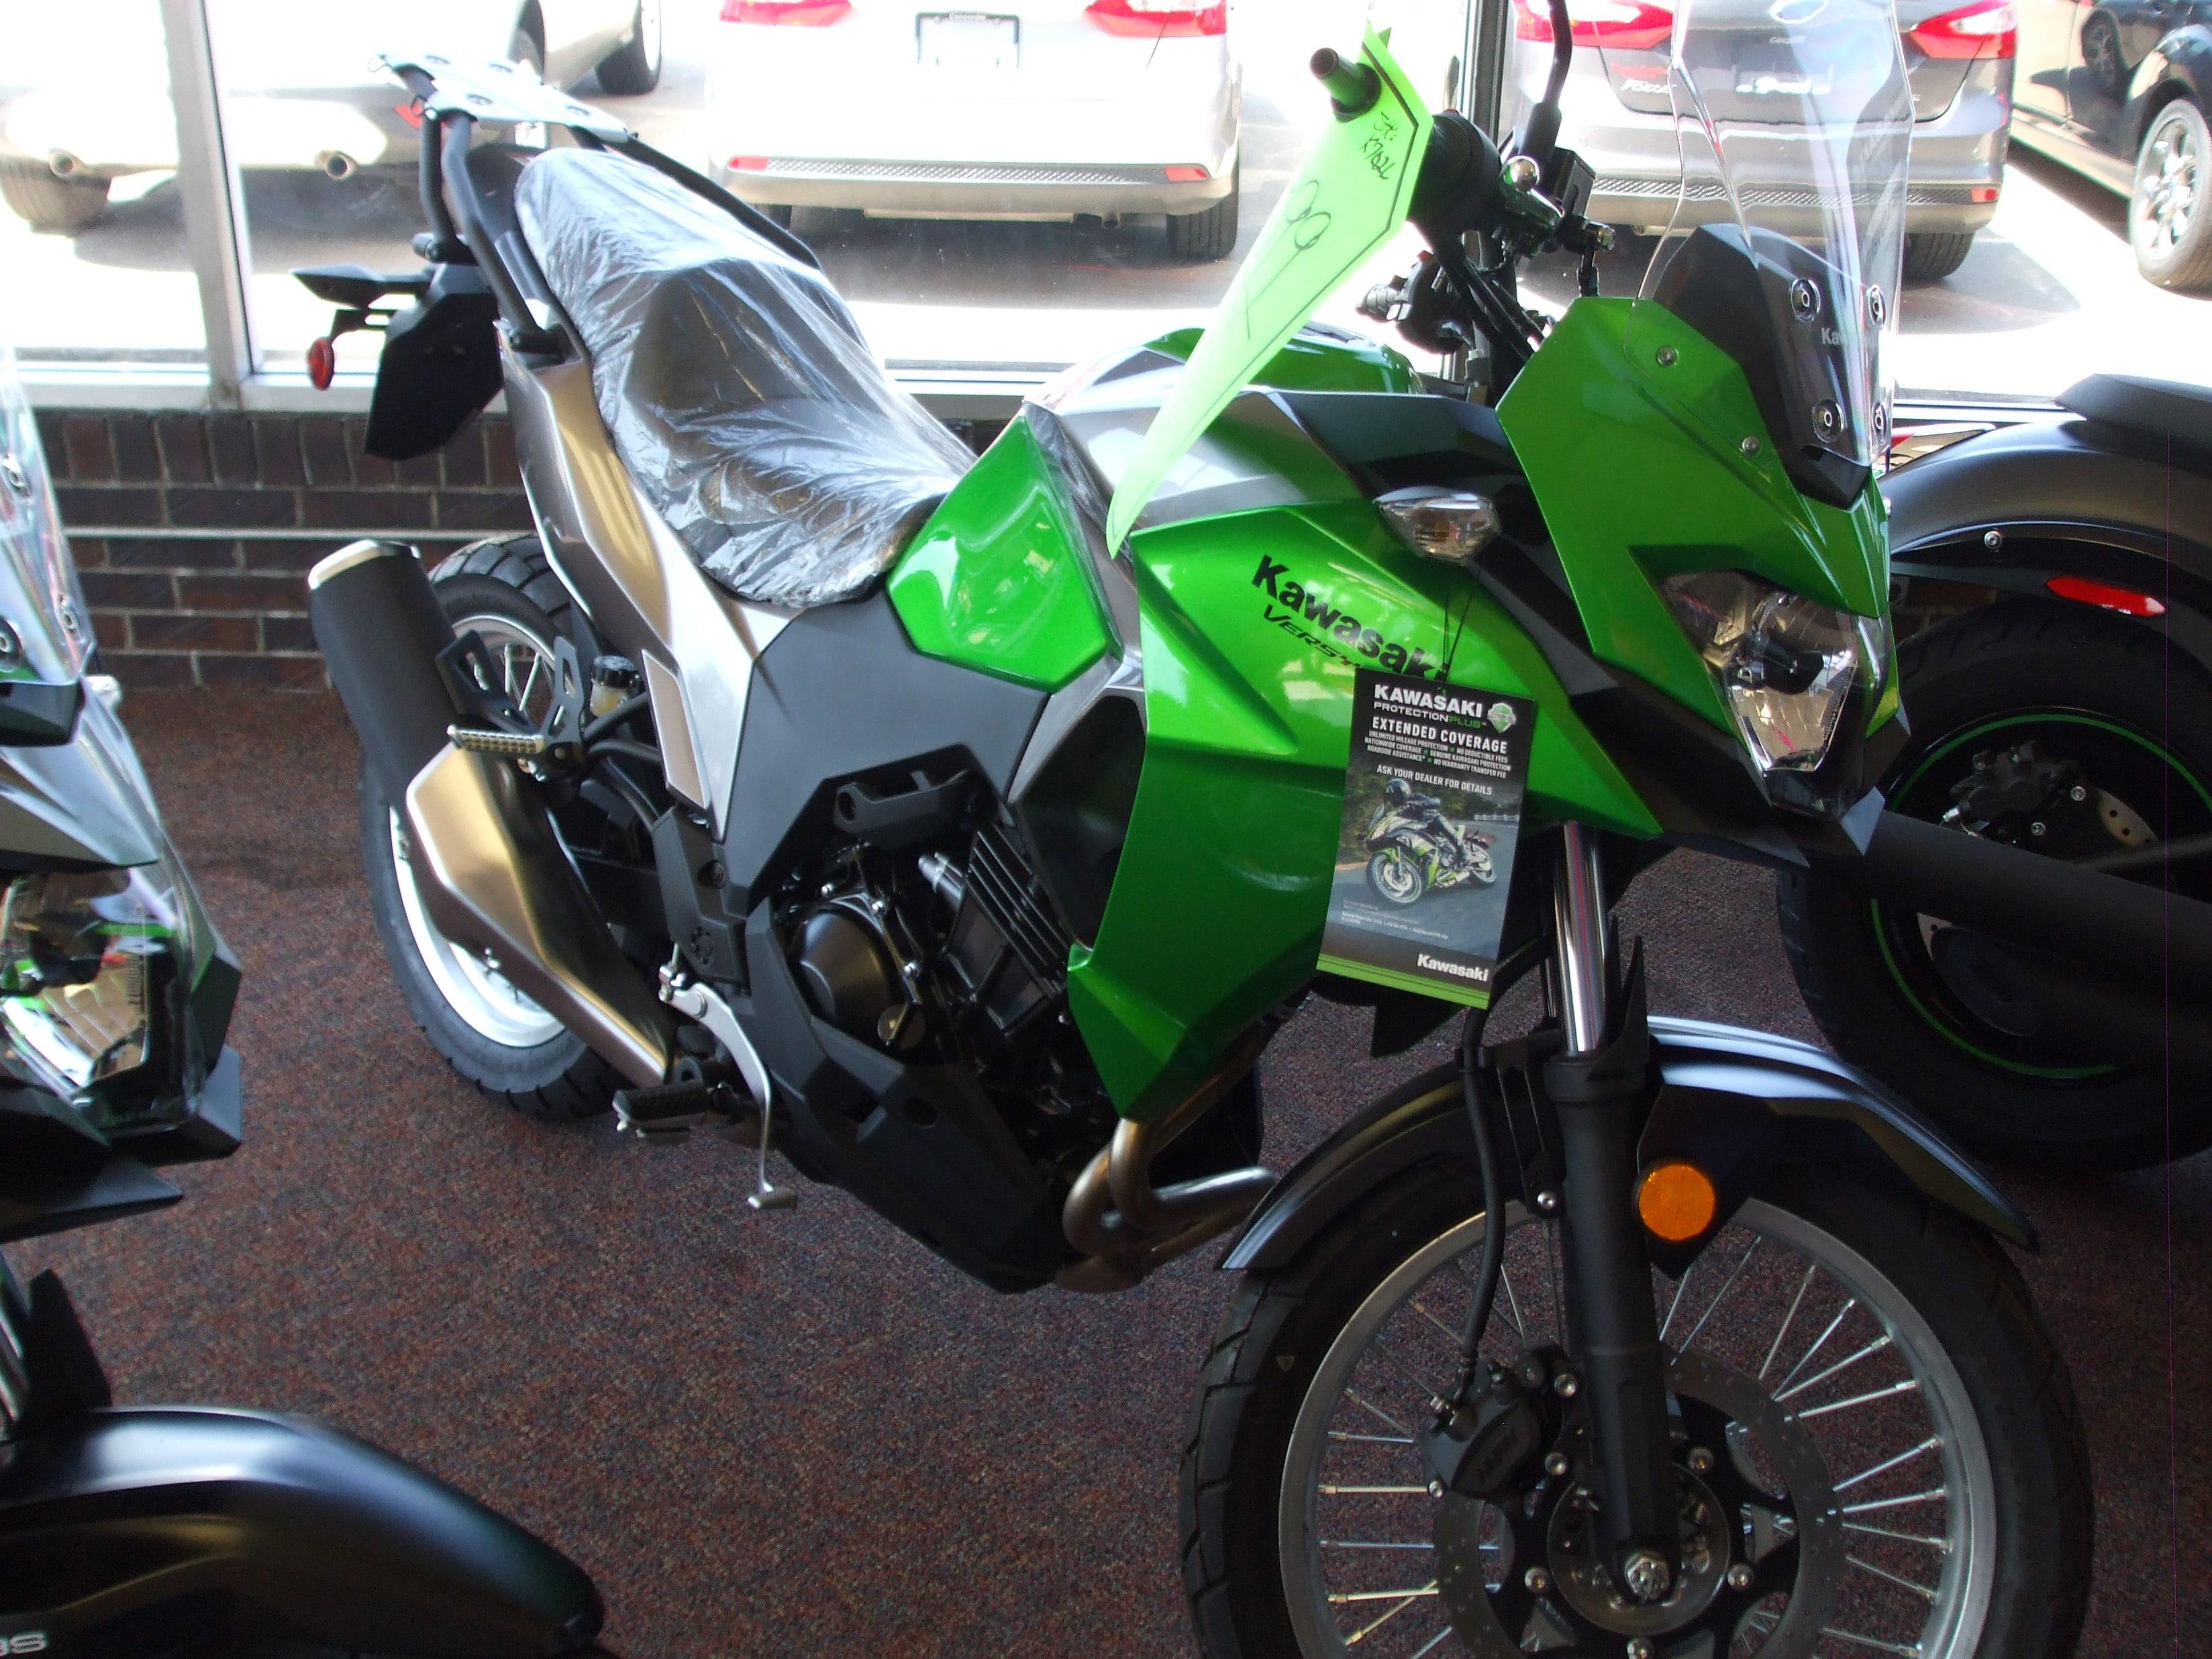 2017 Kawasaki KLE300BHFL Motorcycle